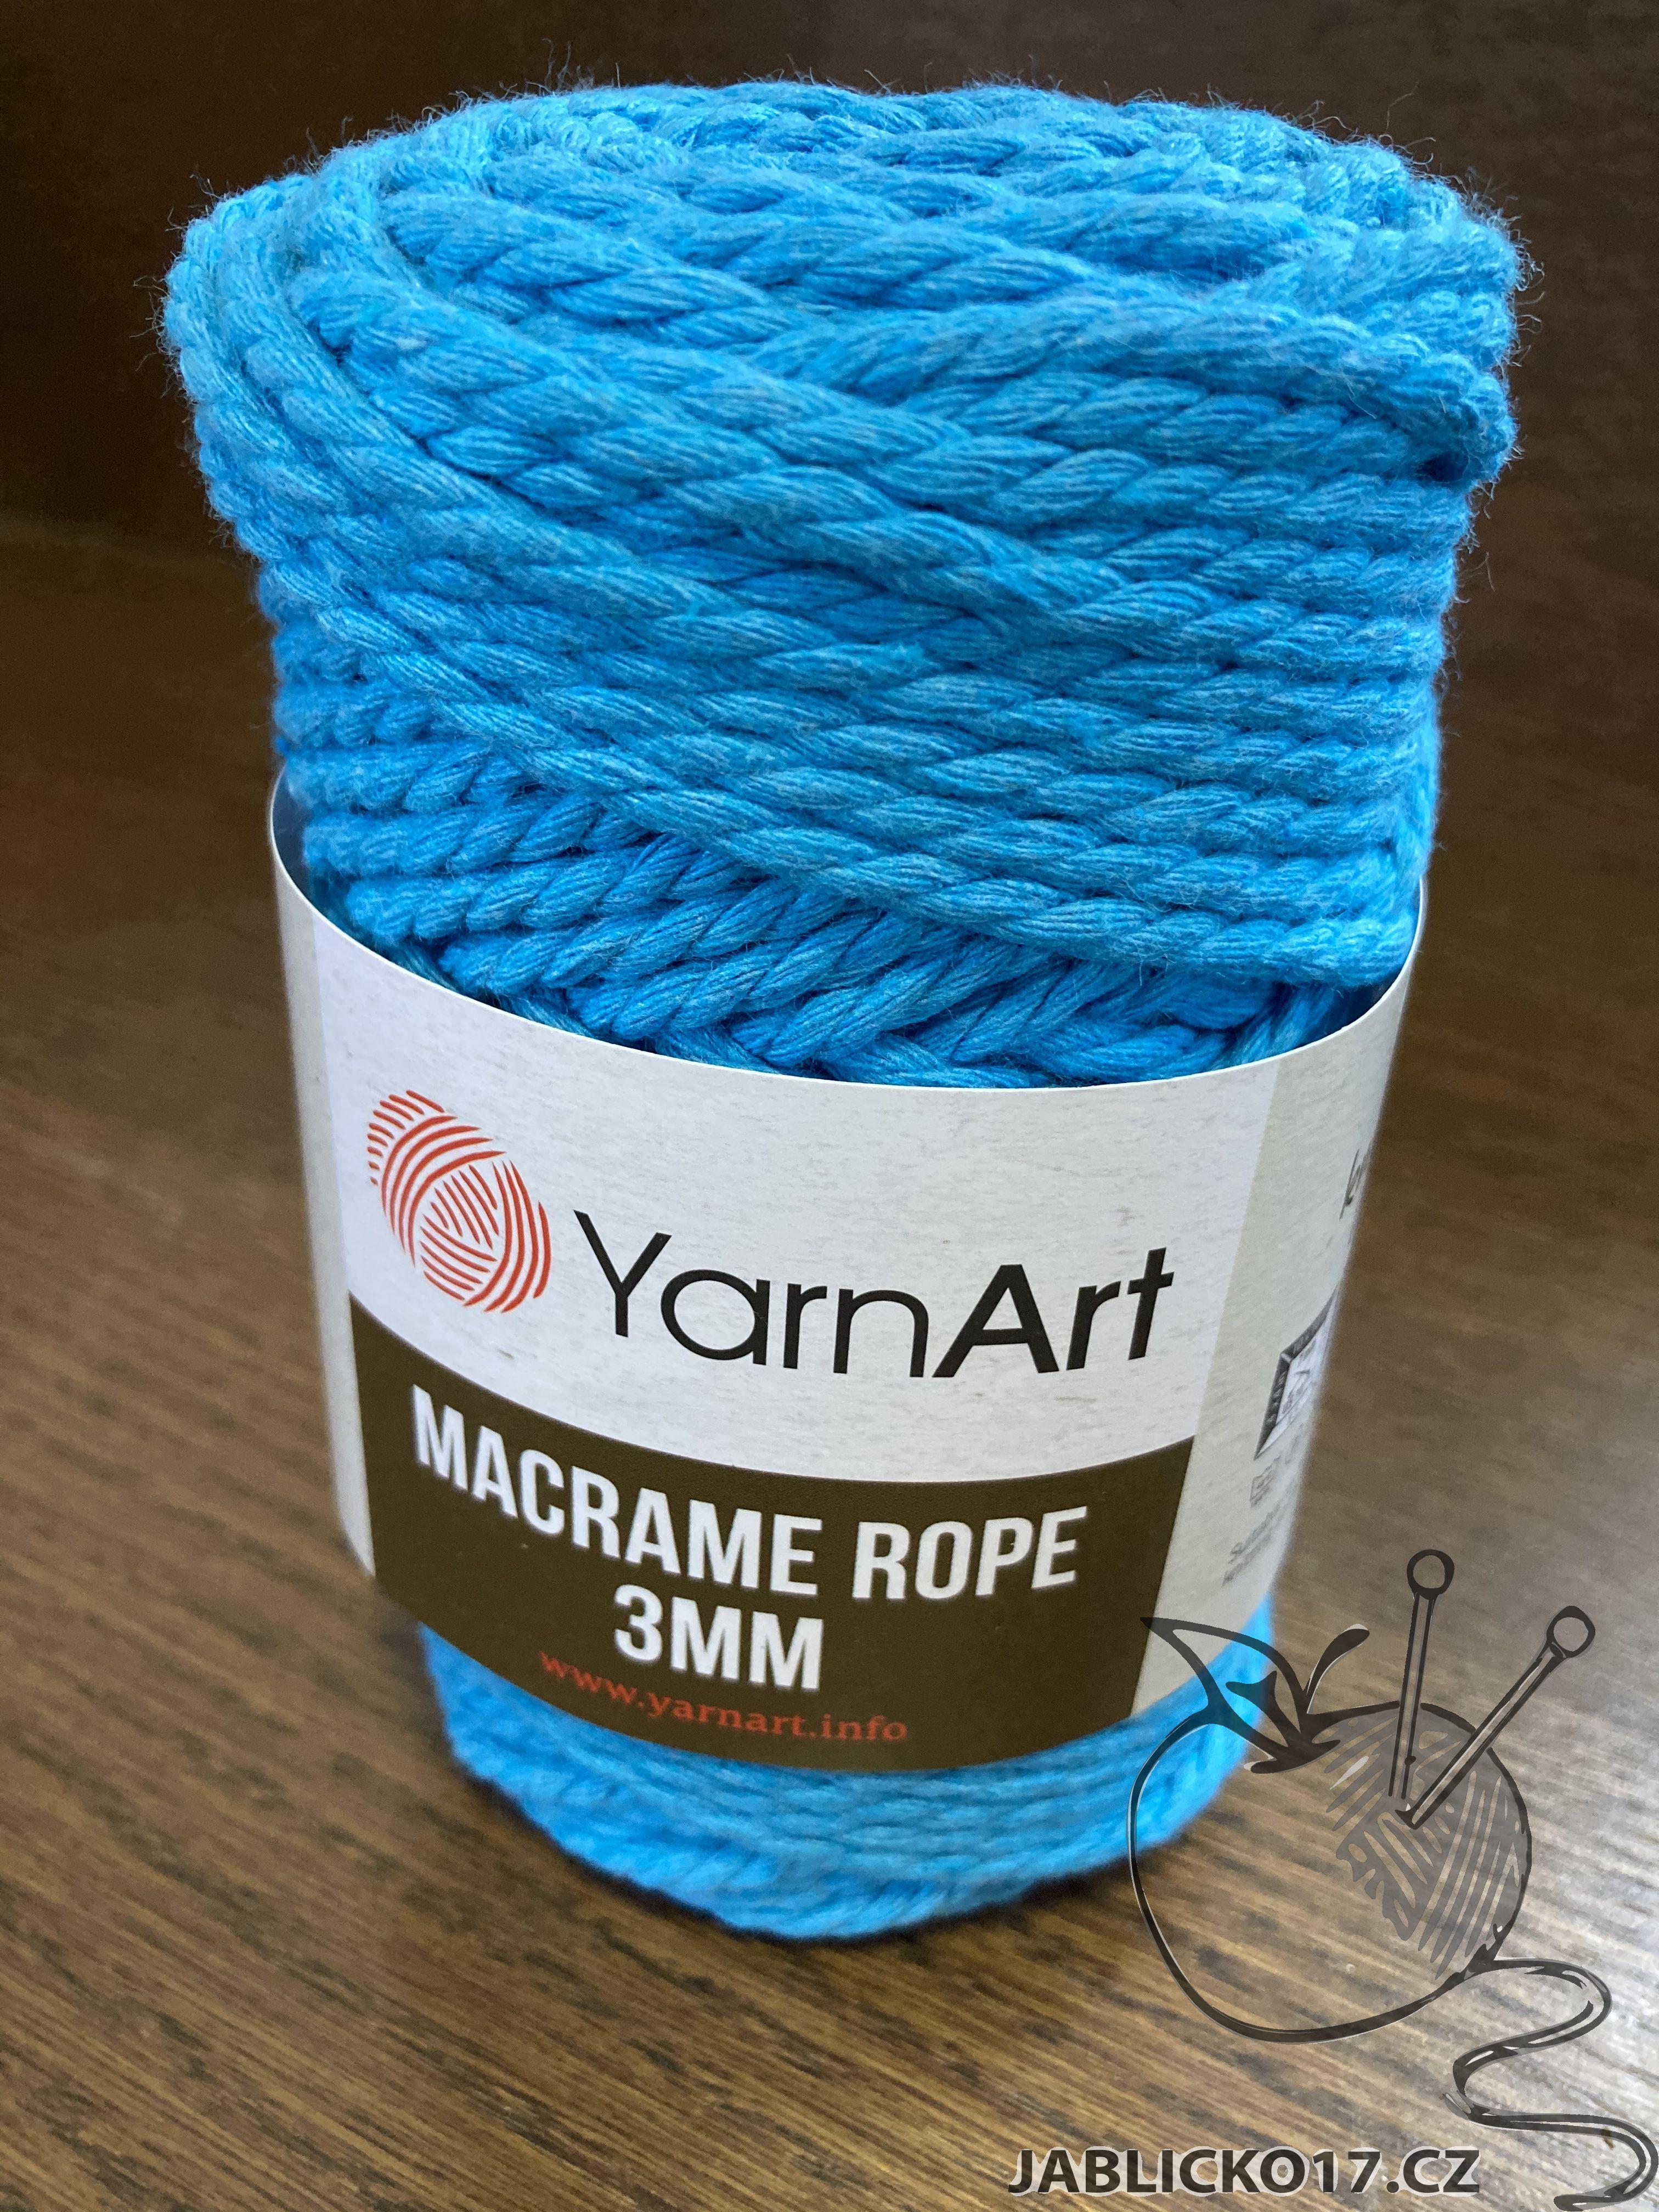 Macrame ROPE 3MM riflová